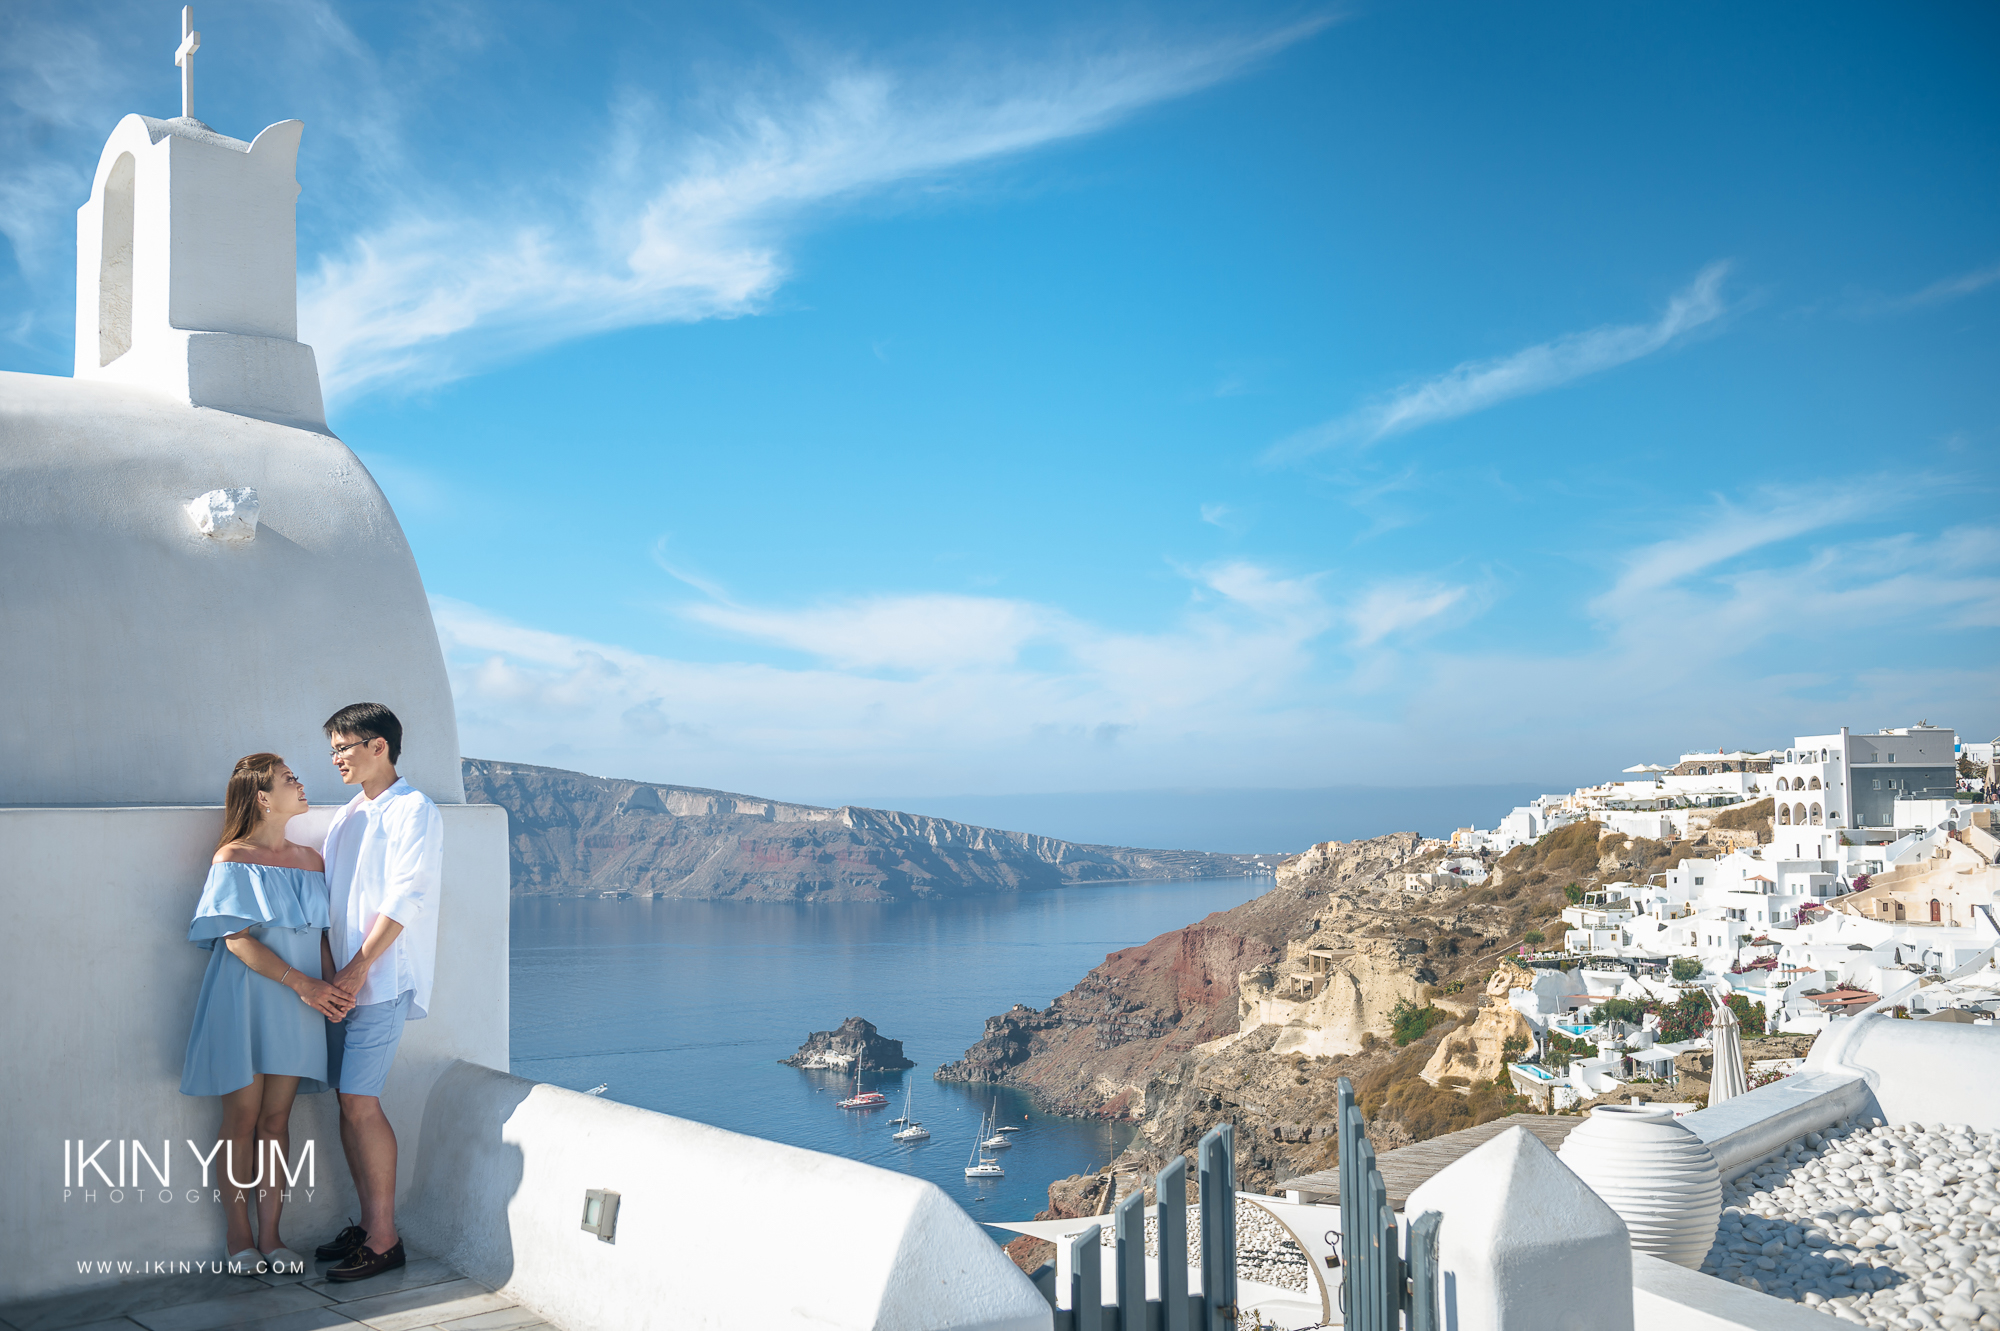 Santorini Pre-Wedding Shoot - London Pre-Wedding Photographer -  英国伦敦婚纱摄影  -  海外婚纱摄影